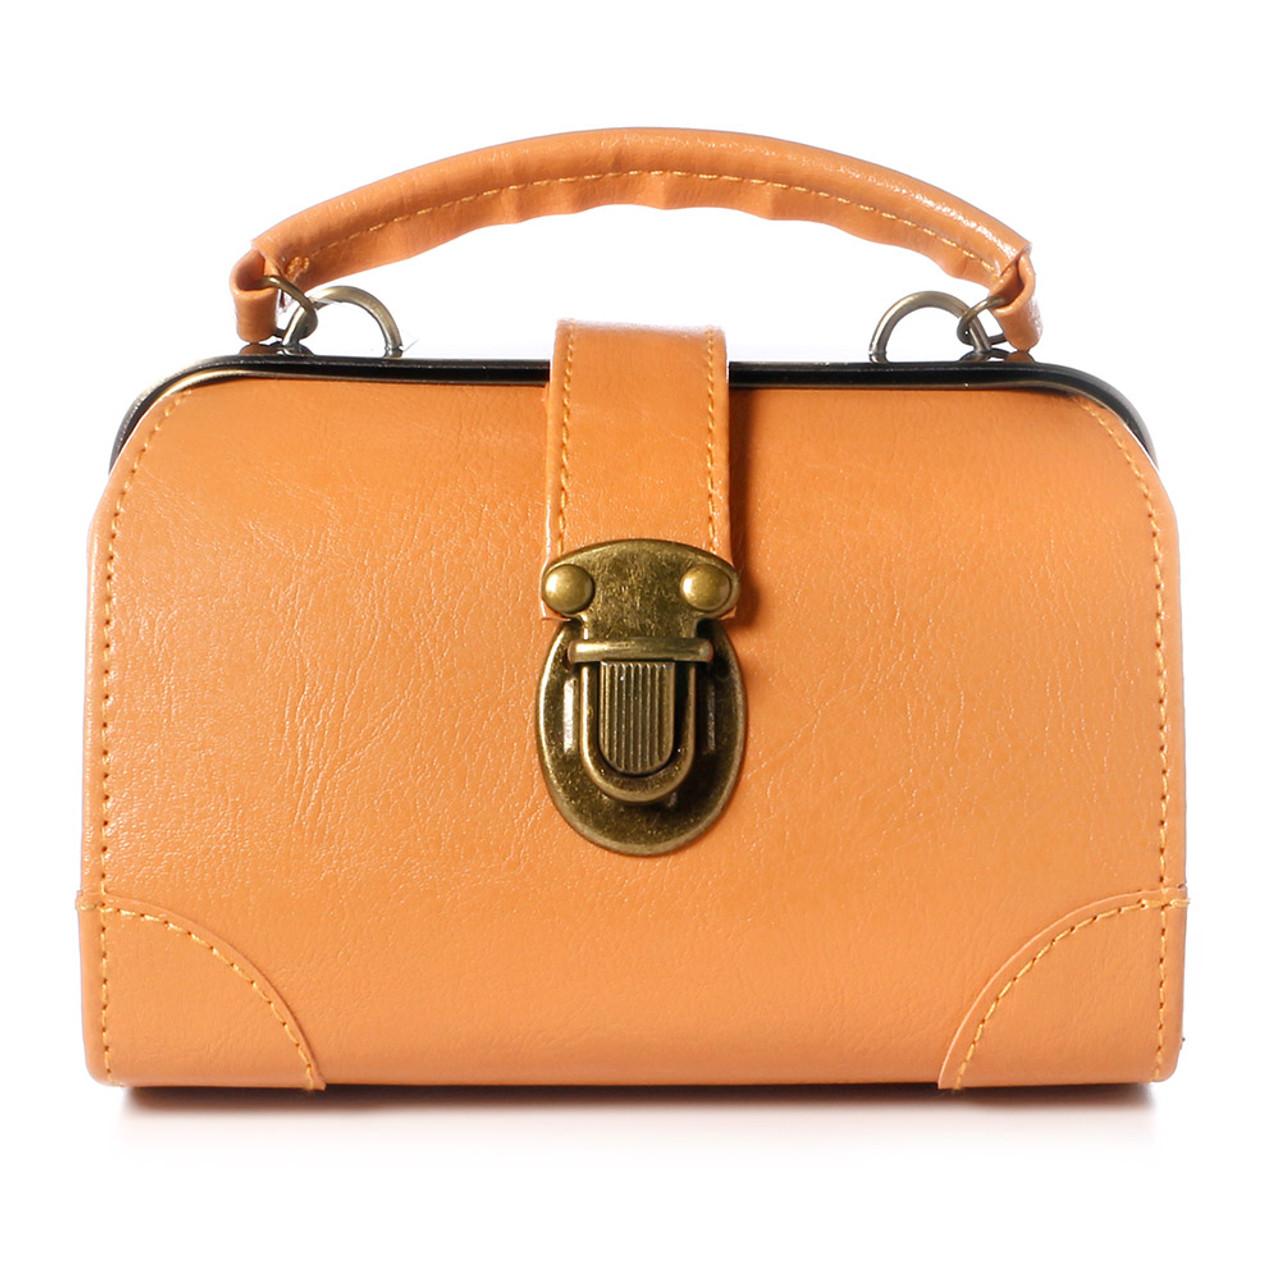 40976106347f Seto Craft Motif Mini Doctor Bag Shape Pouch / Cosmetic Bag - Camel Color